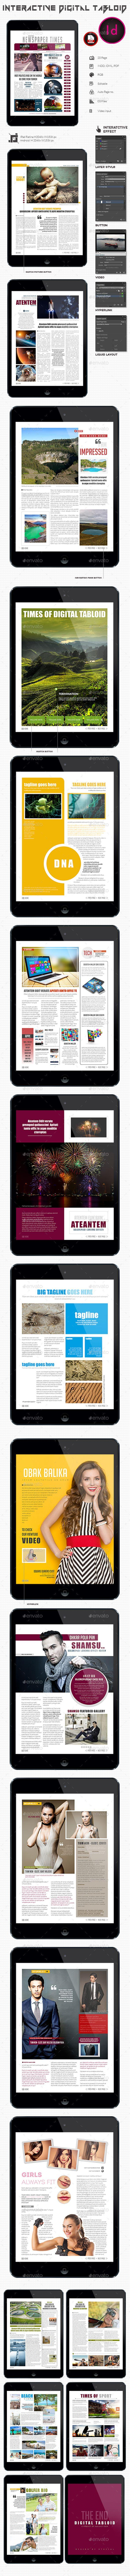 28 best e-Publishing Templates images on Pinterest | Business flyers ...